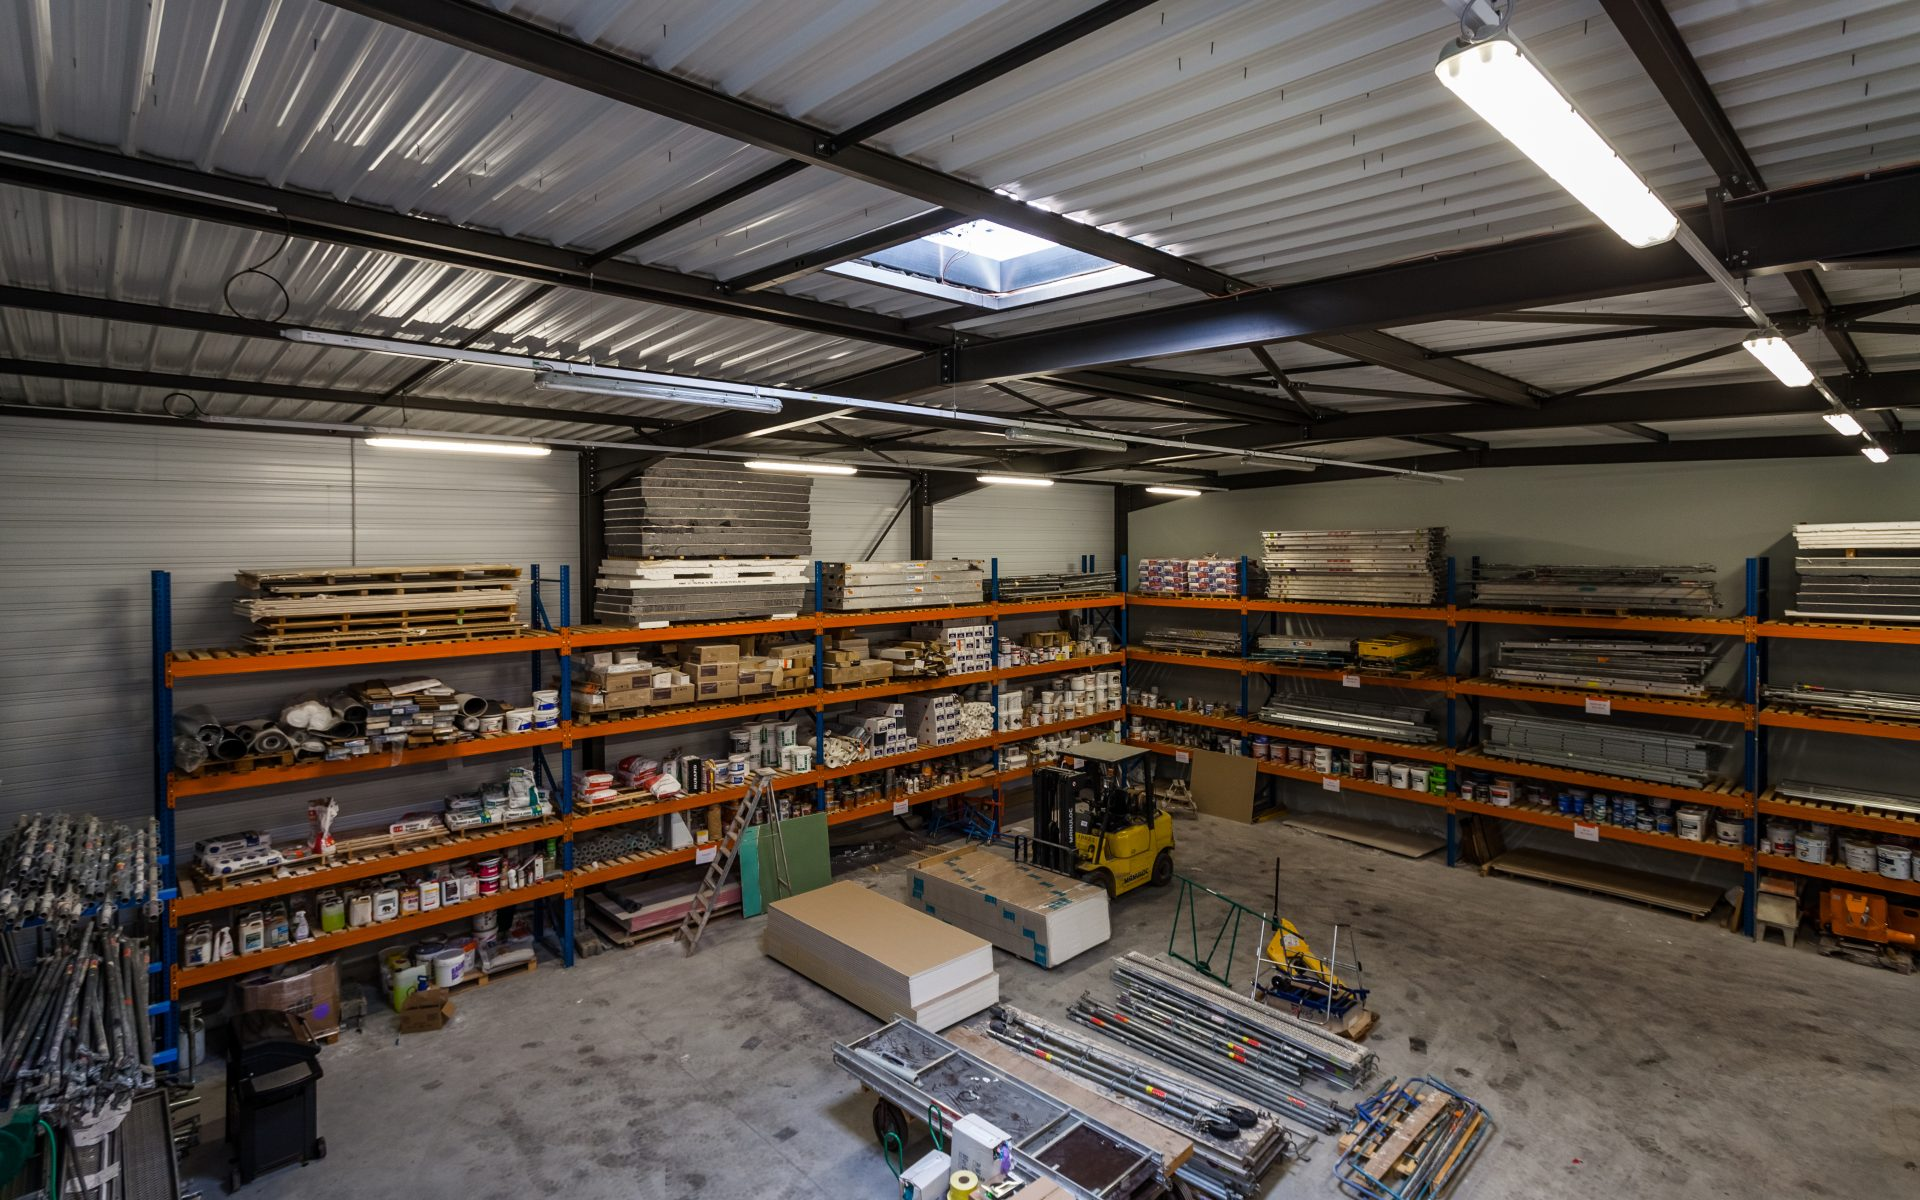 SEGAUD bâtiment artisanal entrepôt stockage bureaux